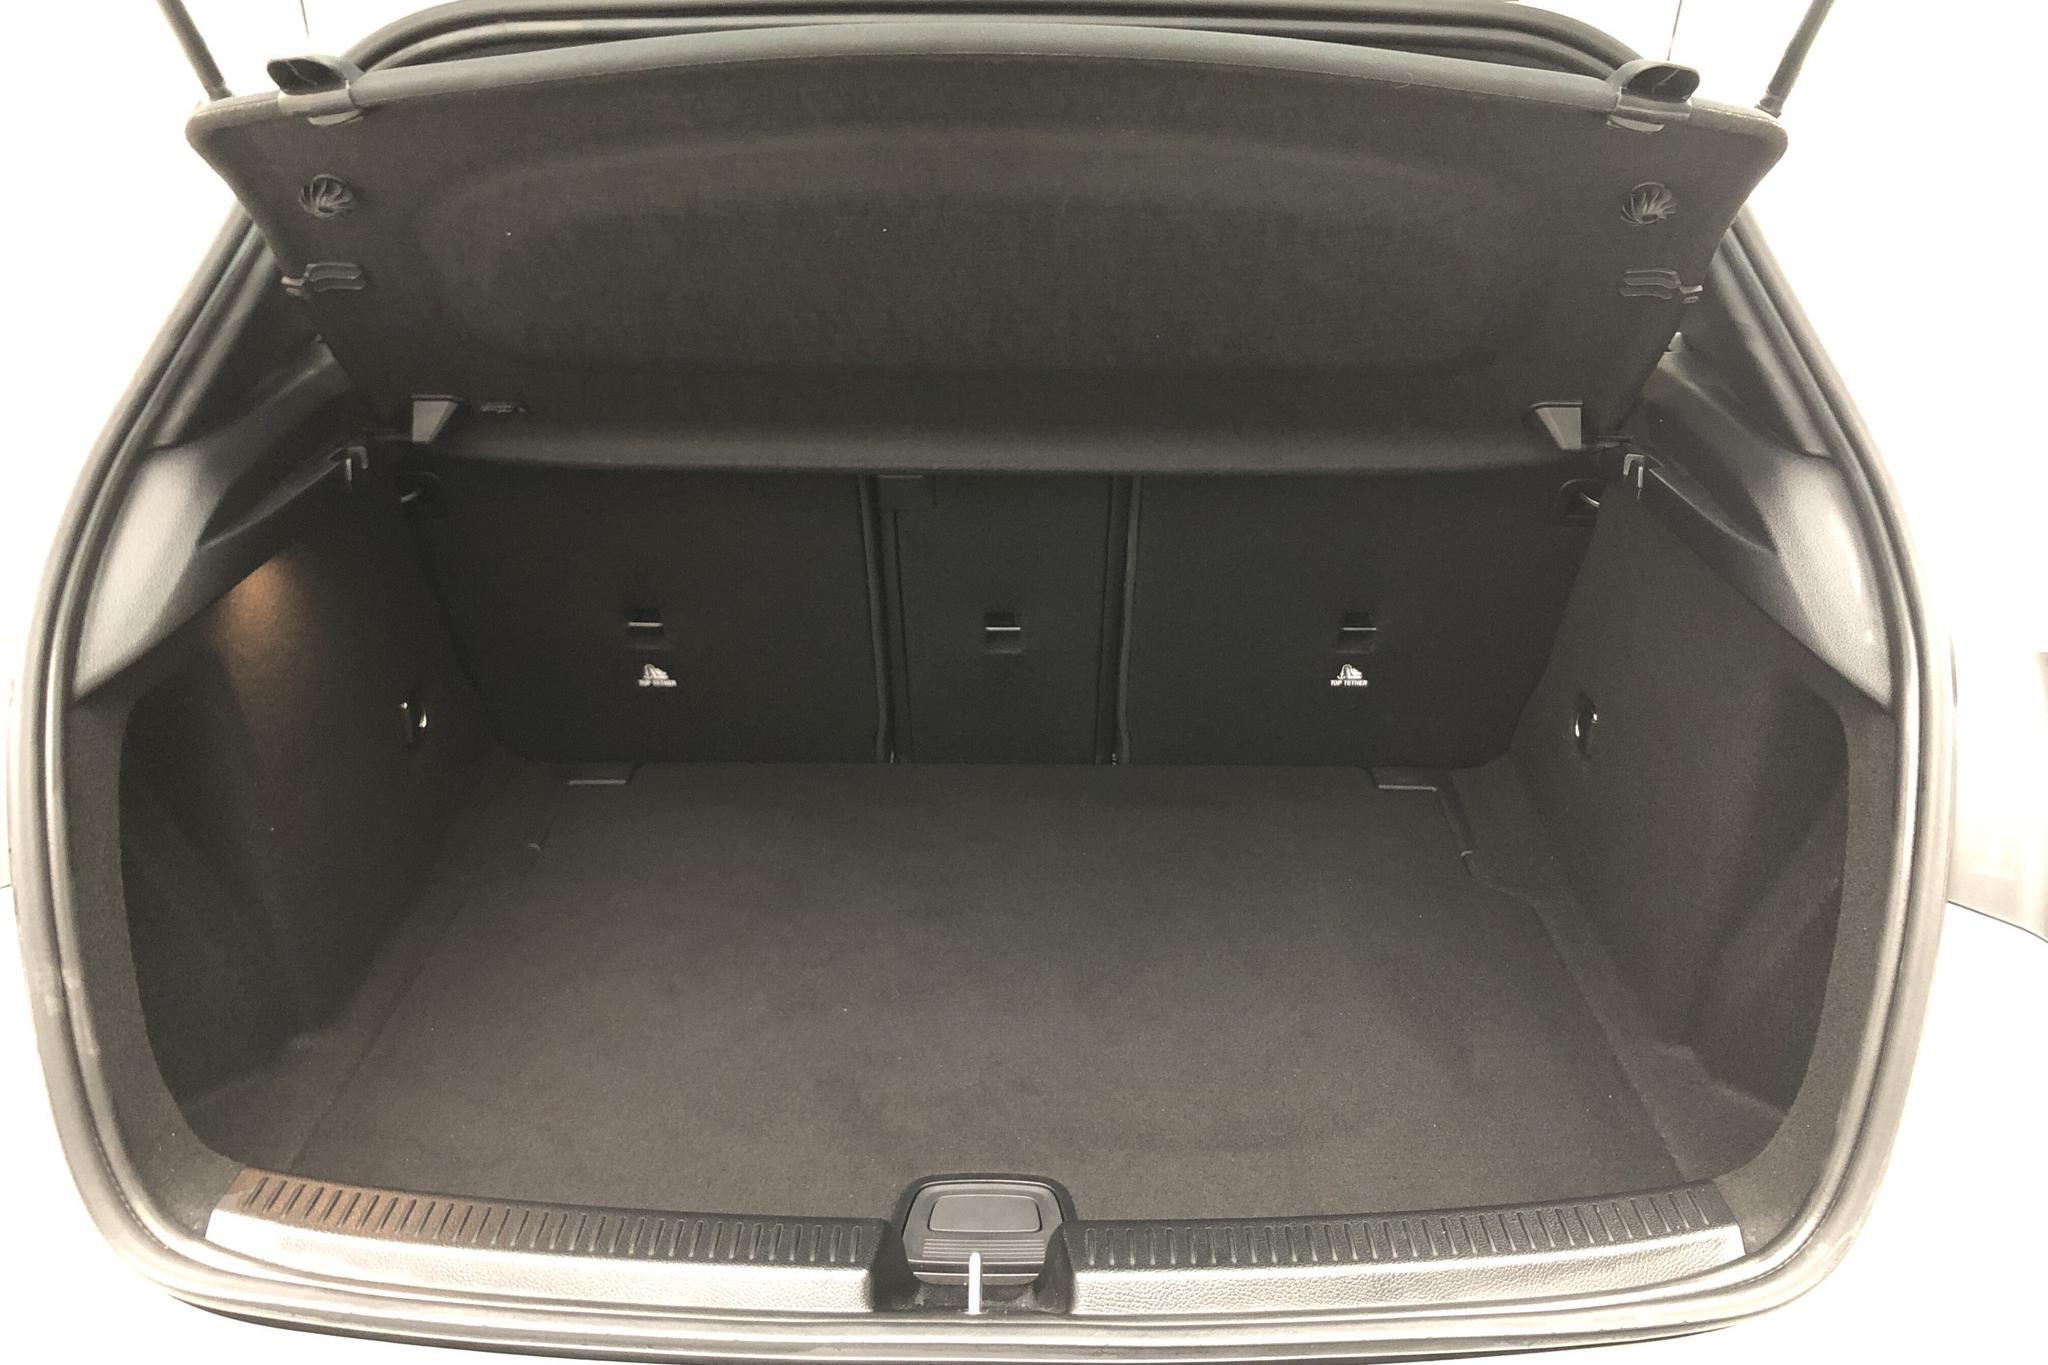 Mercedes A 200 5dr W177 (163hk) - 960 mil - Automat - silver - 2018